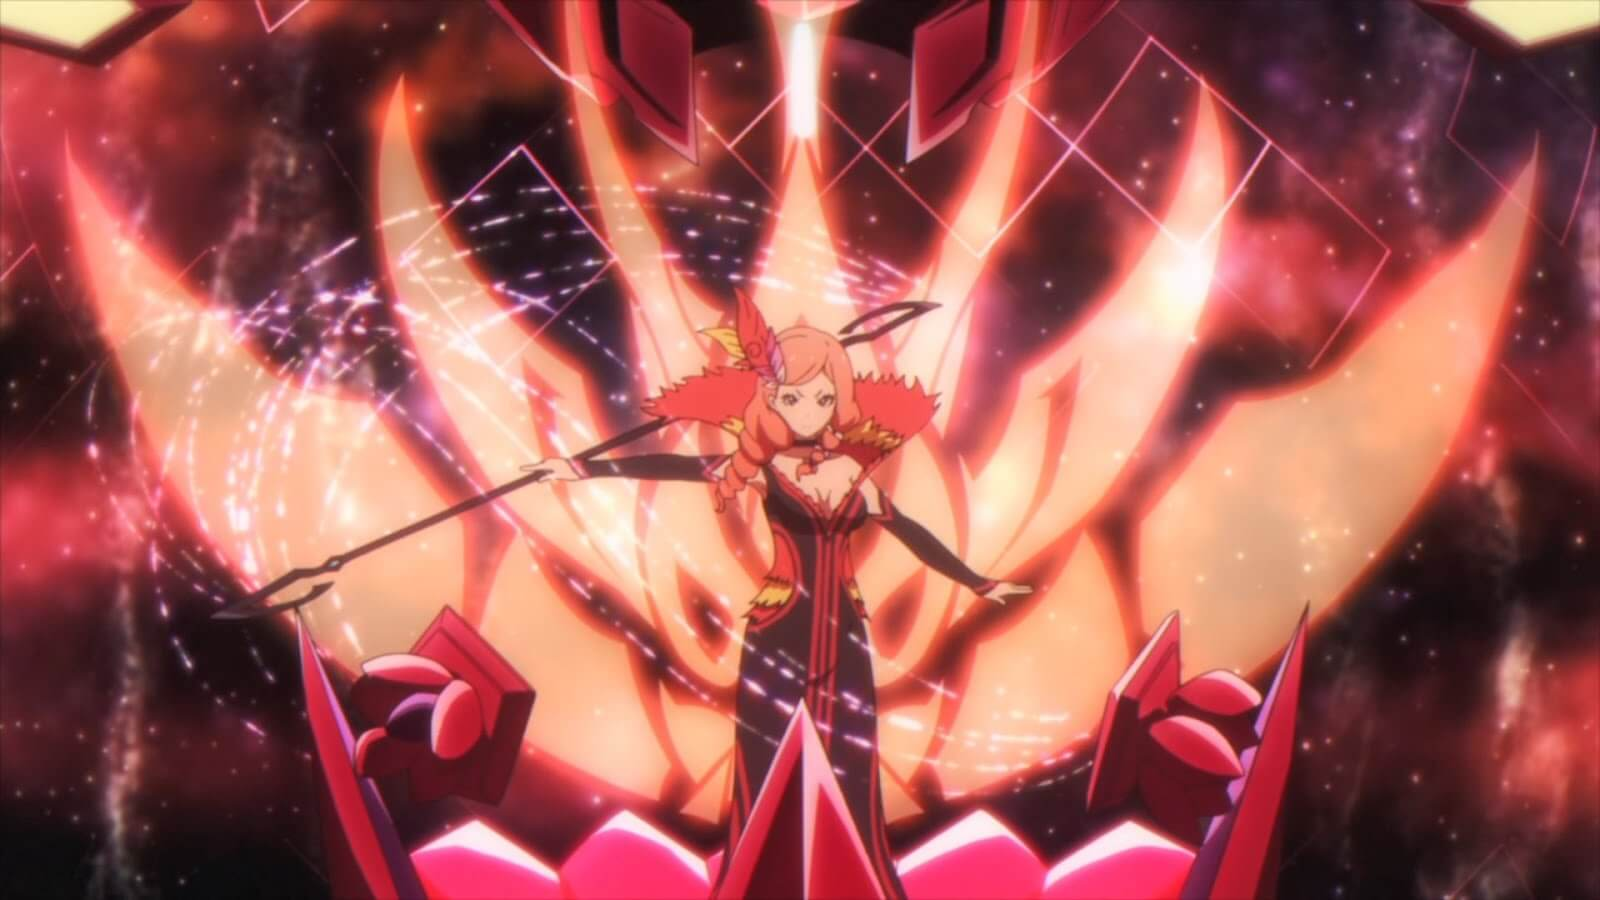 Descargar anime de Granbelm subtitulado en español